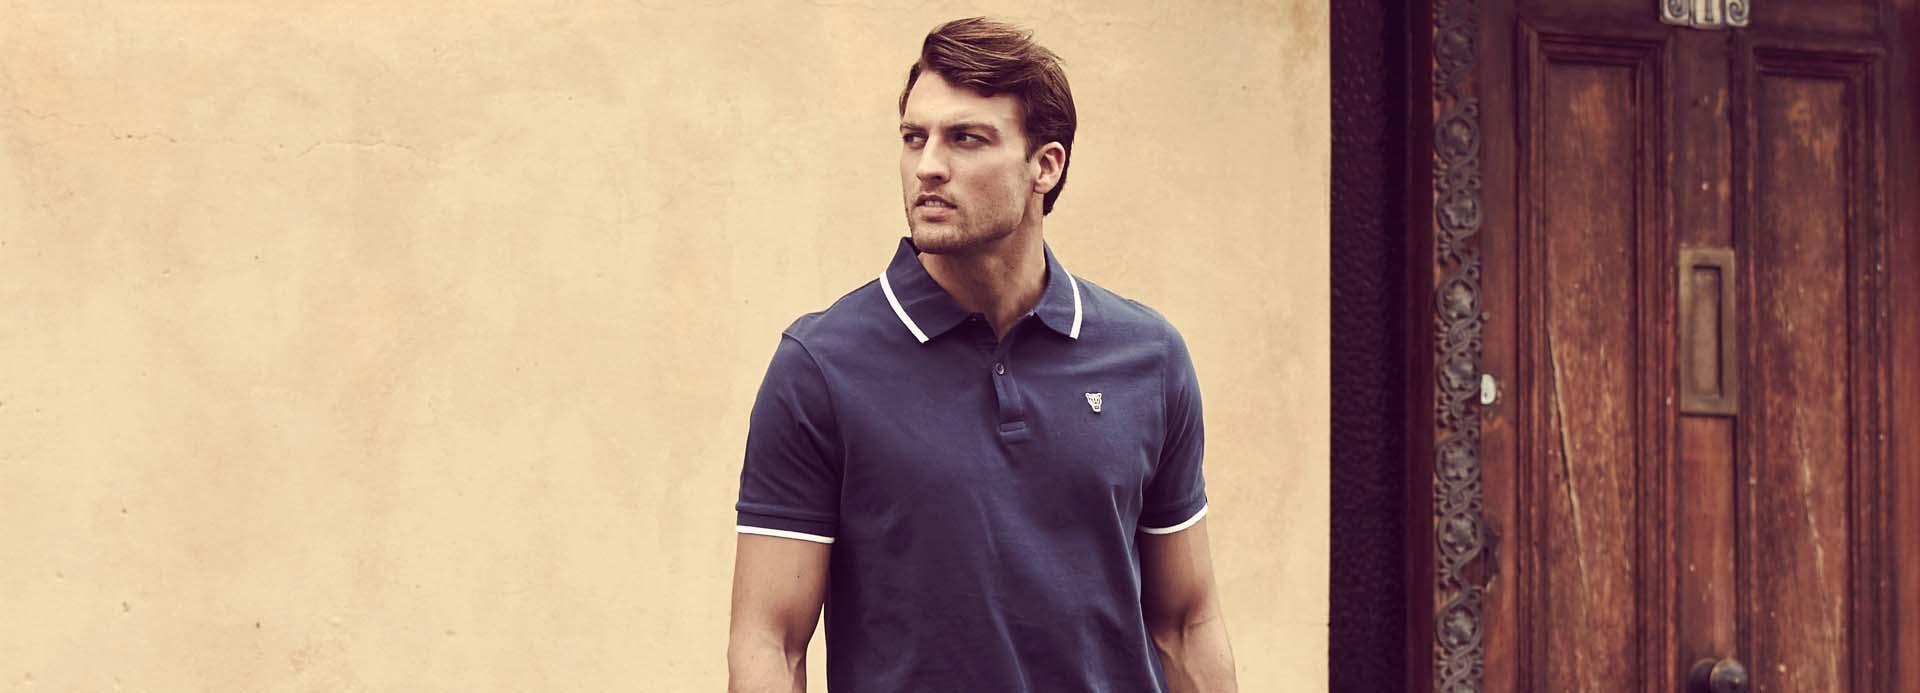 Sports-t-shirt-manufacturers-in-tirupur, t shirt manufacturer in tirupur, Indies Apparels, men's t shirt manufacturers